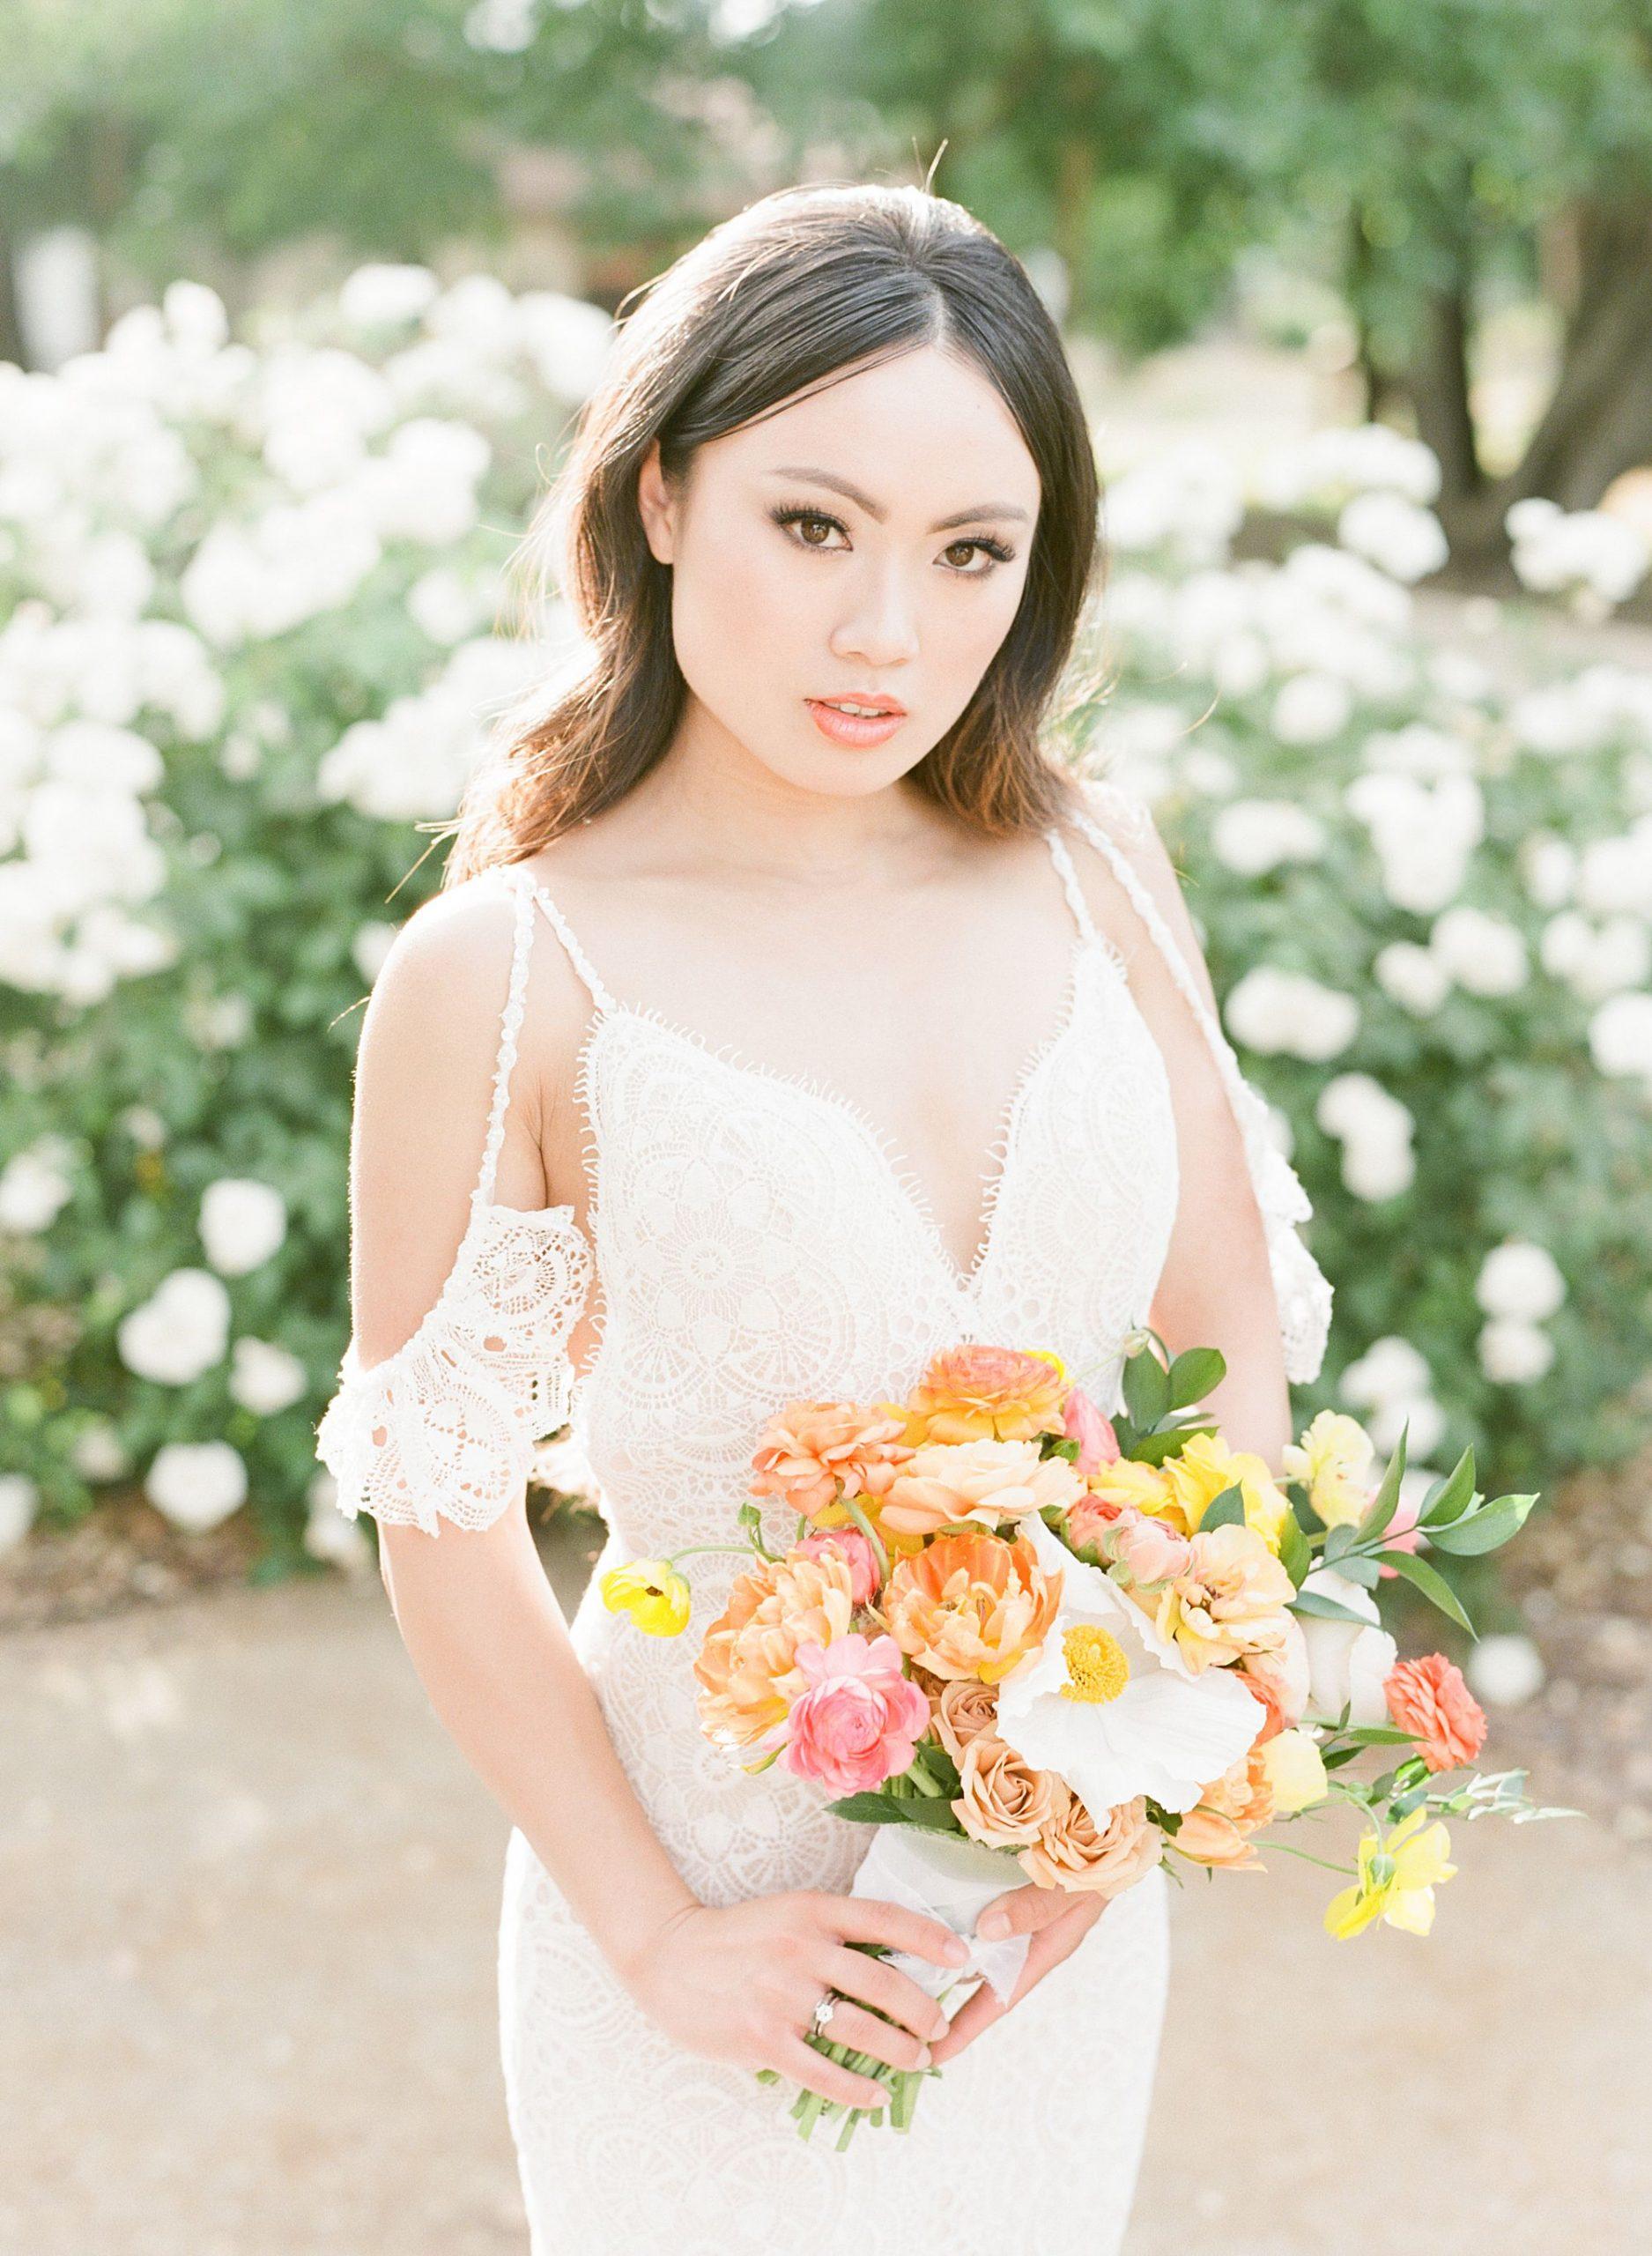 Italian Wedding Inspiration at The Maples Wedding & Event Center - Featured on Wedding Chicks - Ashley Baumgartner - Sacramento Wedding Phtoographer_0015.jpg